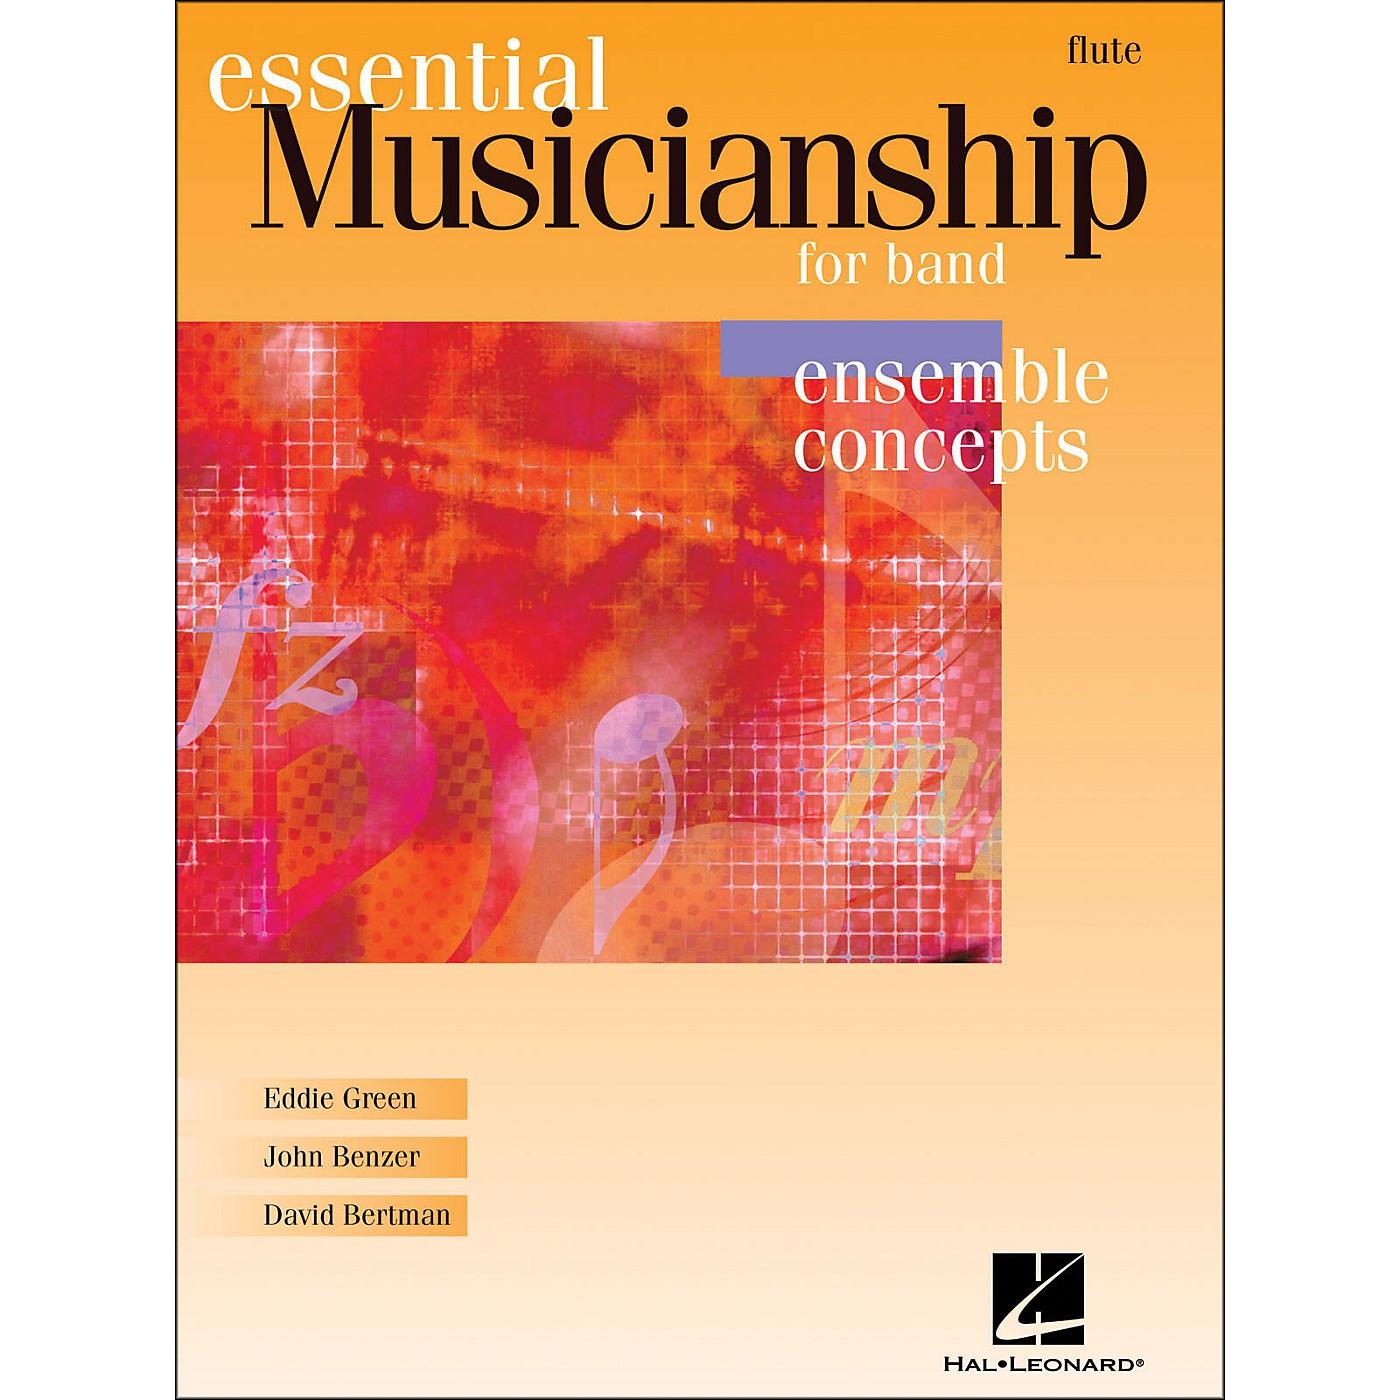 Hal Leonard Essential Musicianship for Band - Ensemble Concepts Flute thumbnail